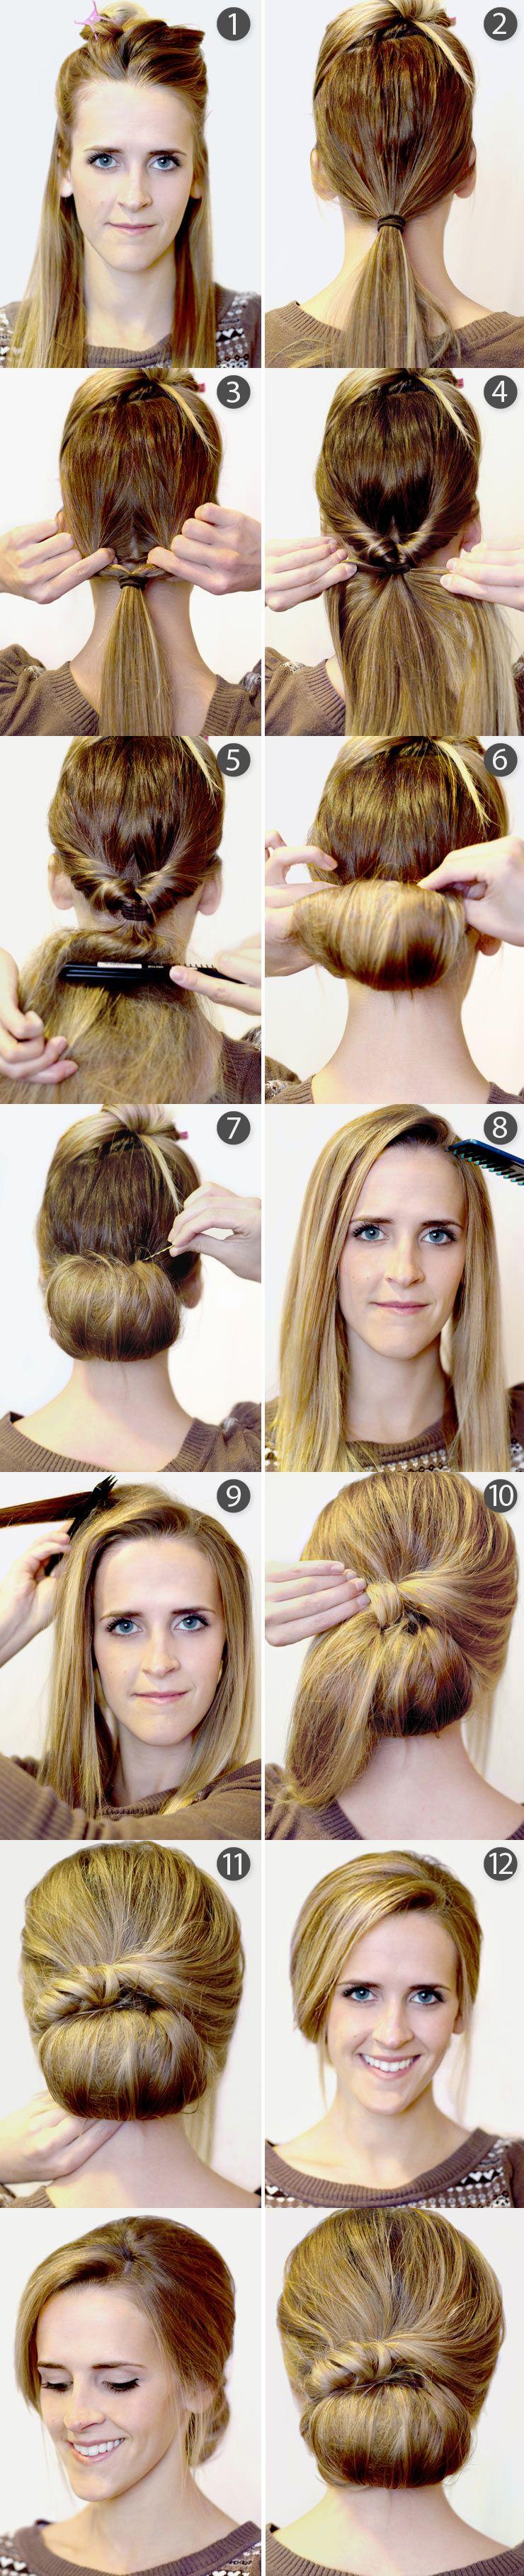 TUTO COIFFURE faire un chignon rétro Hair styles, Hair